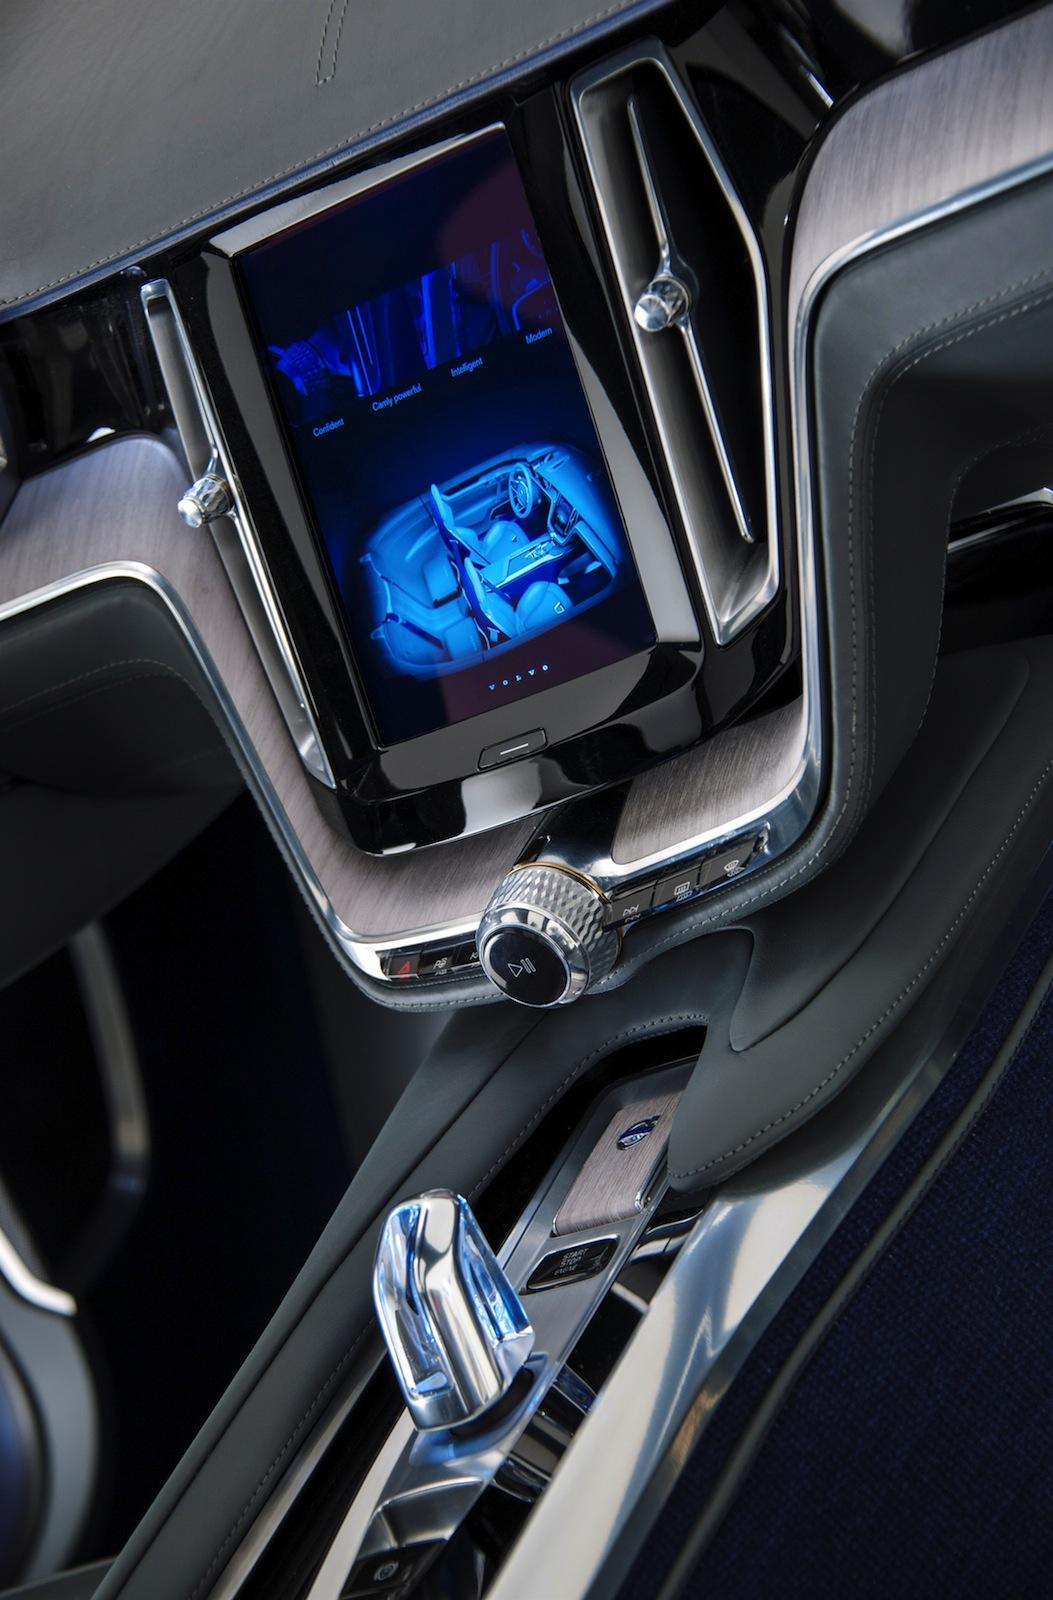 Volvo Concept Coupe previews new design language - photos ...